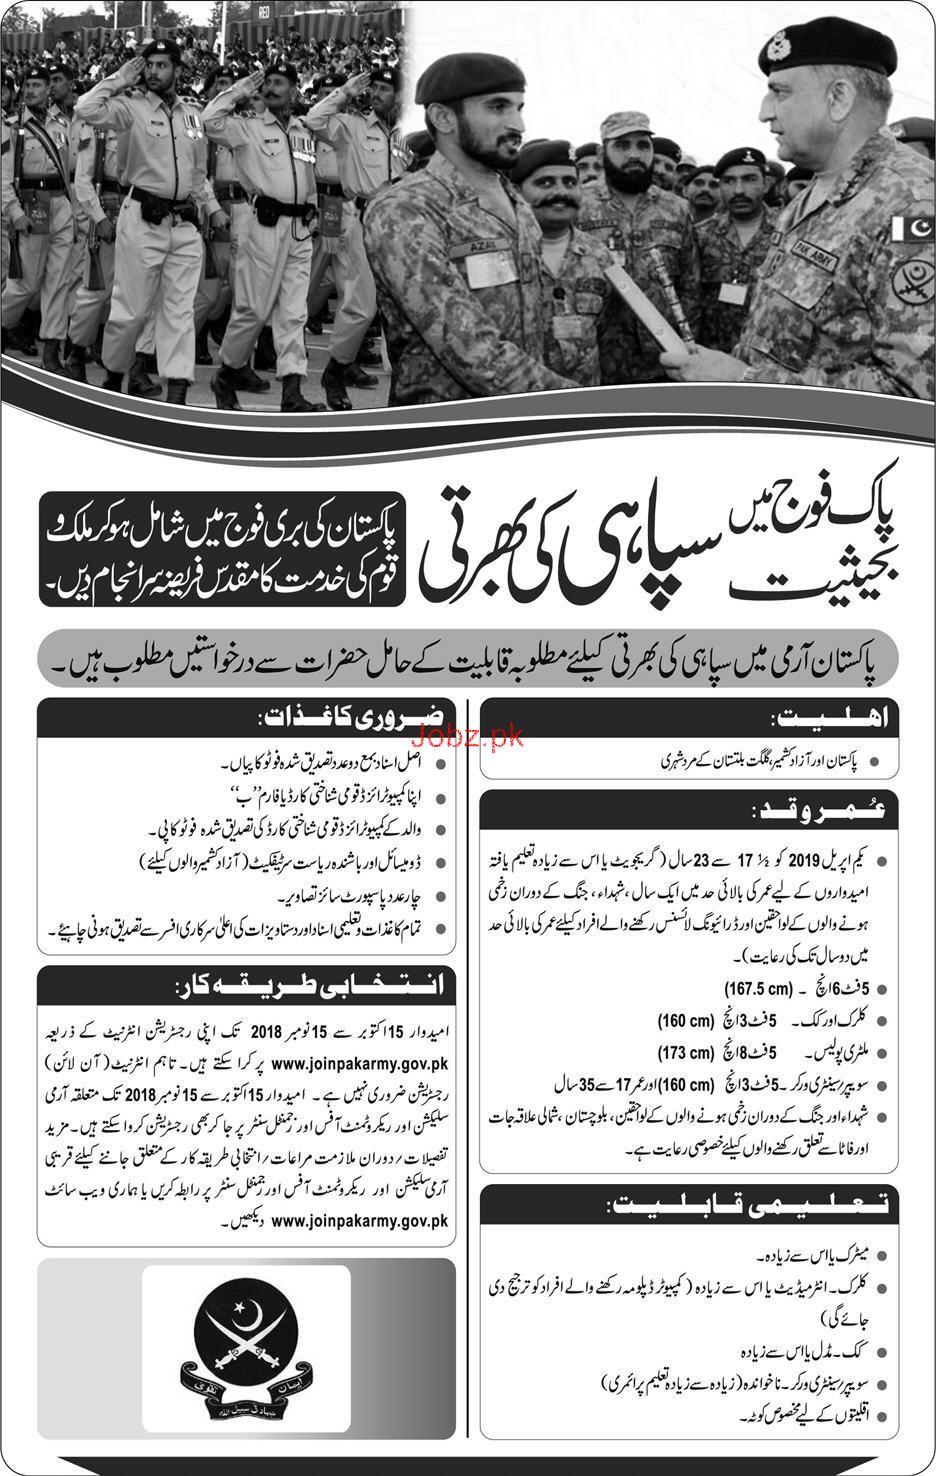 Recruitment of Soilders in Pakistan Army